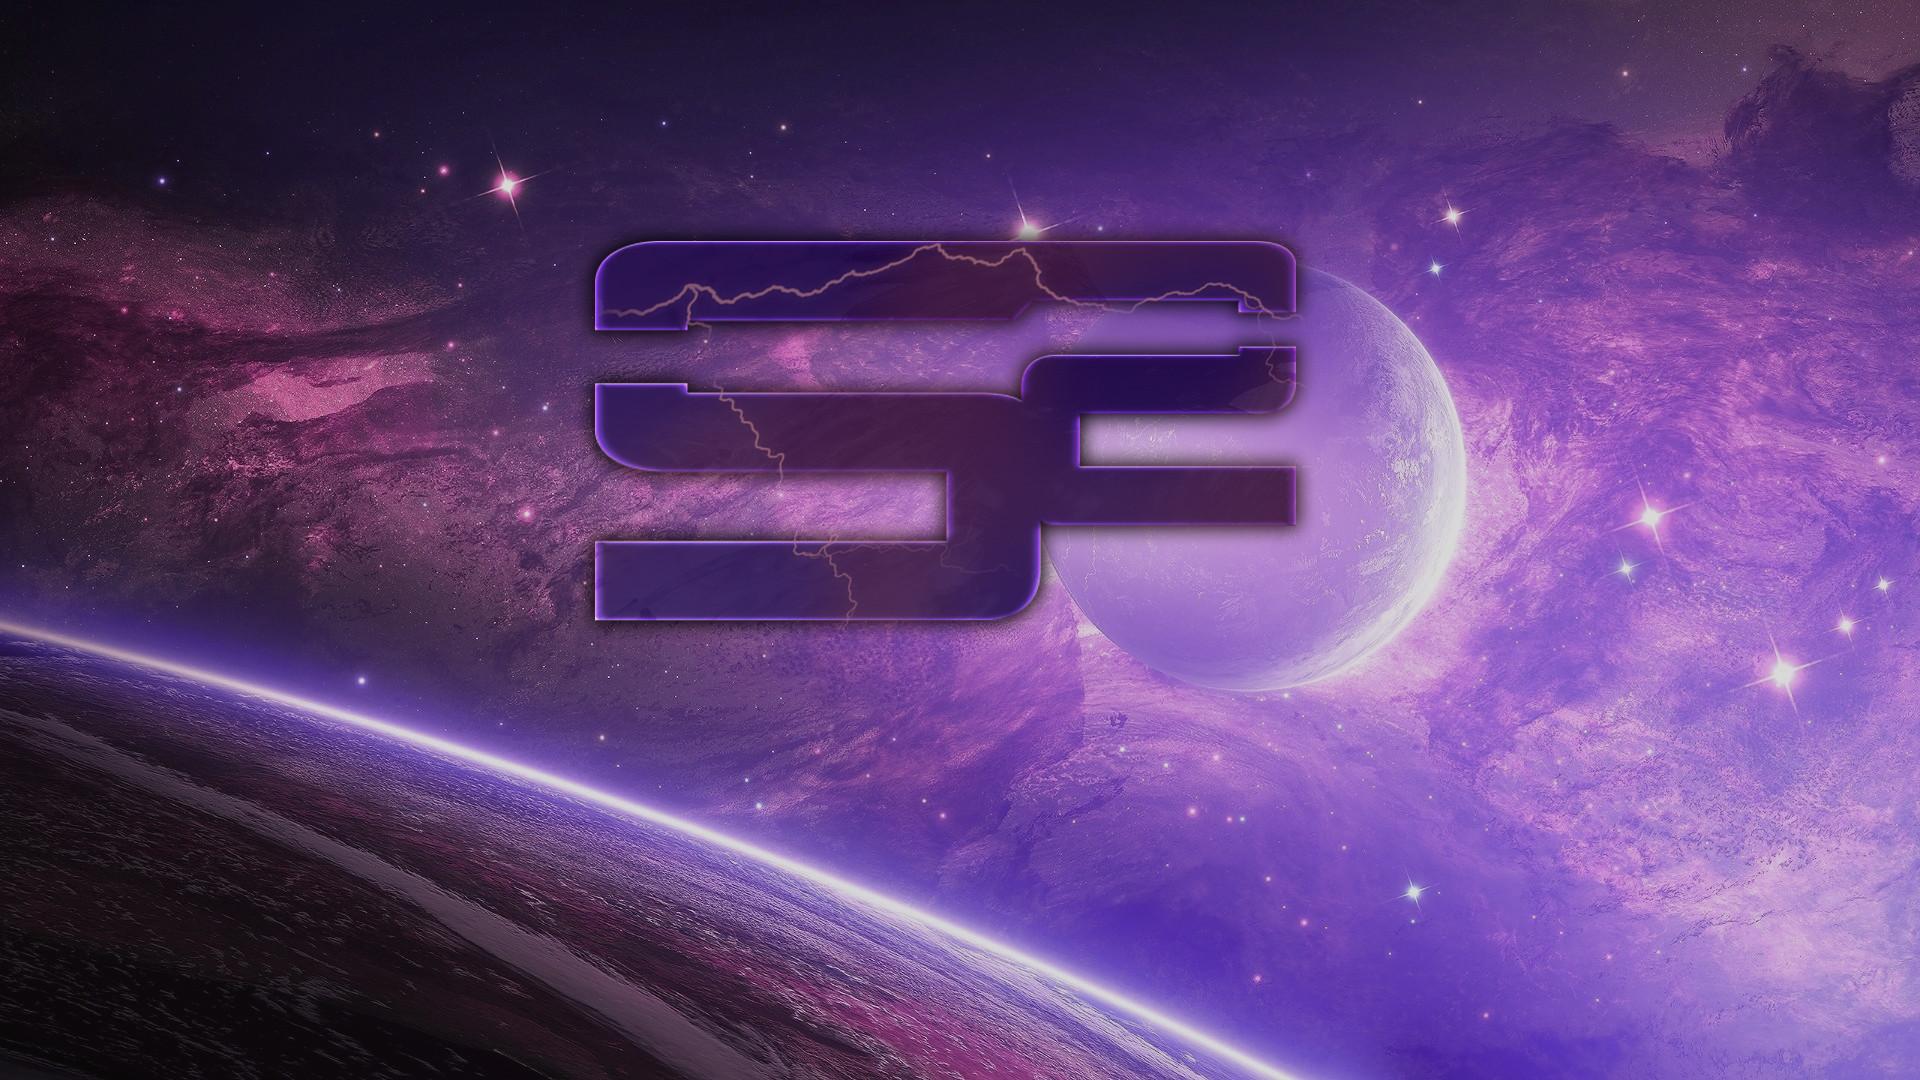 … SoaR Gaming wallpaper galaxy edition! by FearFoxDesigns